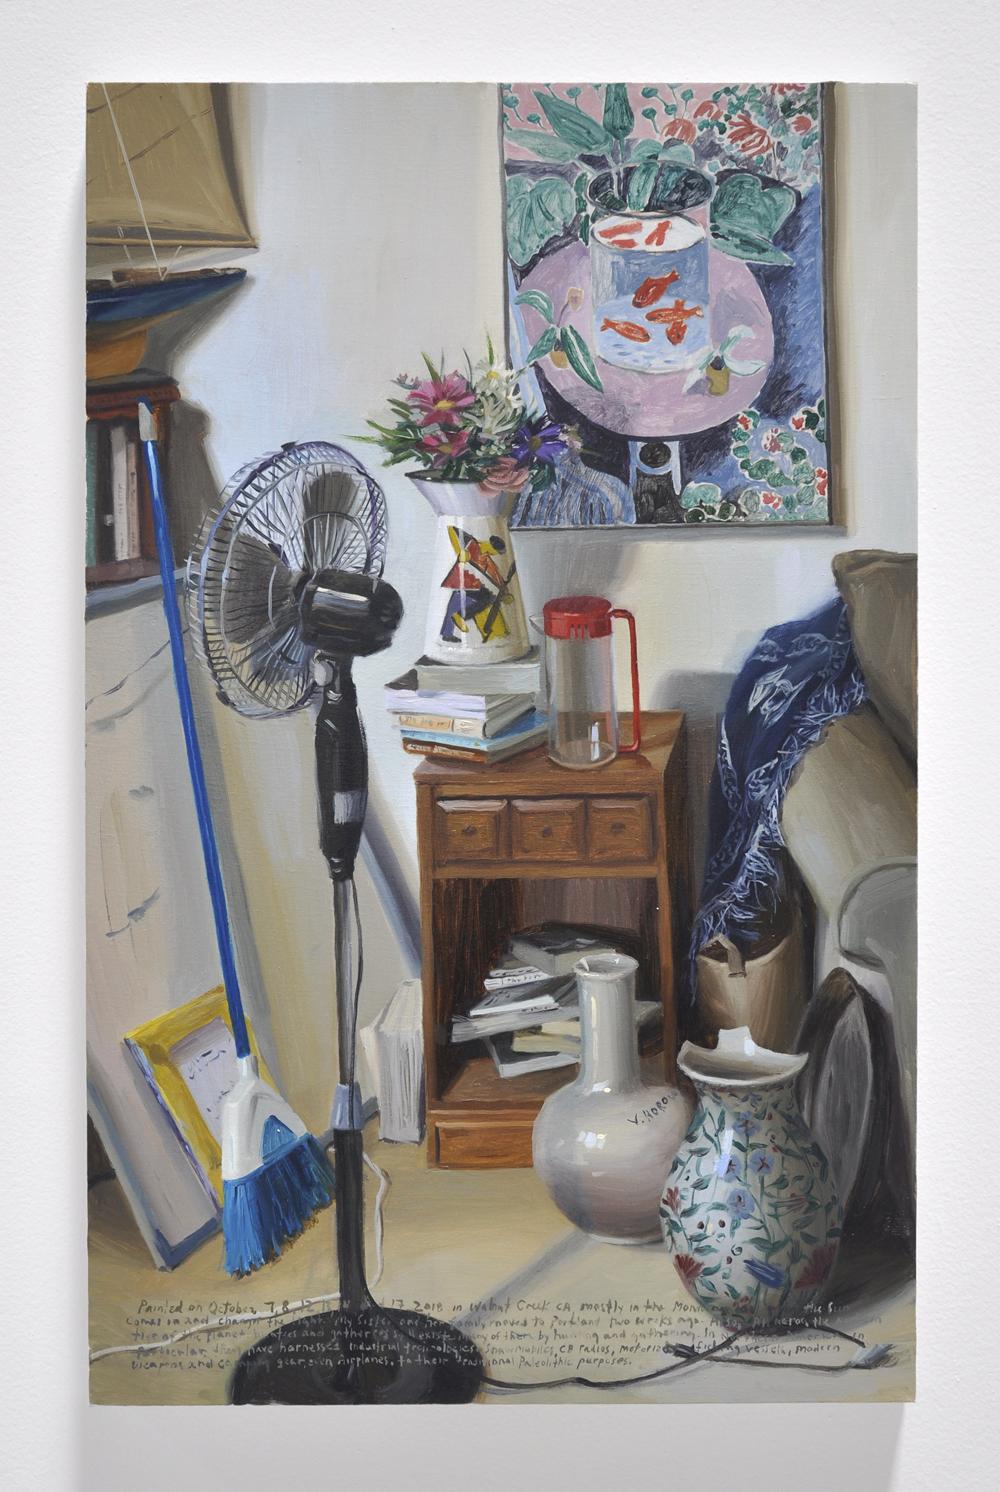 Terry Powers, Communist Vase, 35 x 22in, Oil on linen, 2018